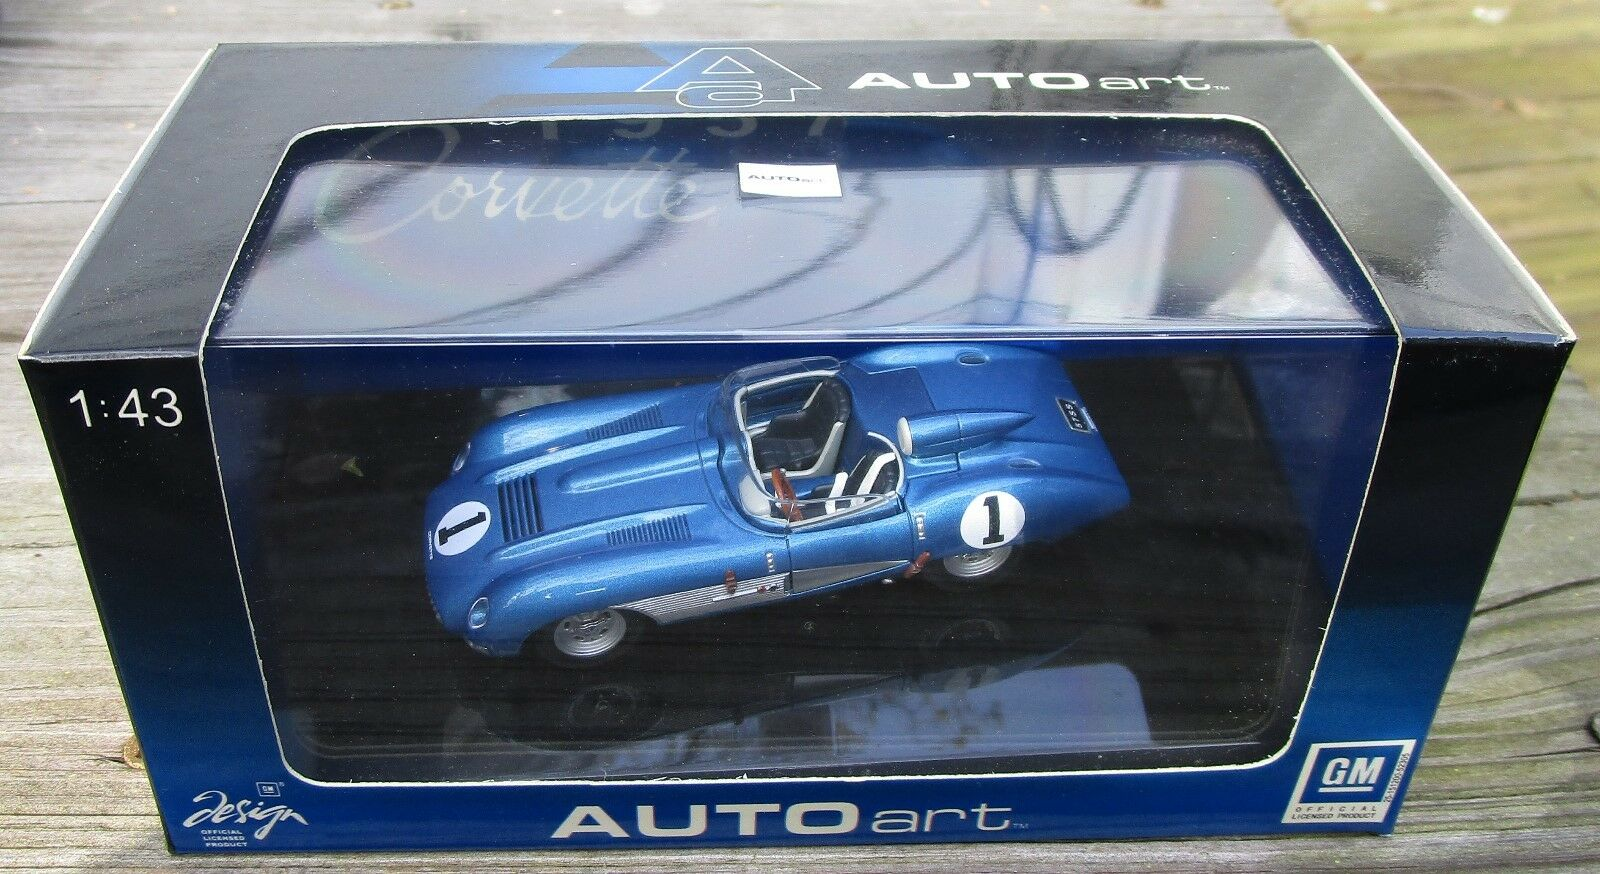 Auto Art 1 43 1957 Chevrolet Corvette Corvette Corvette Ss efbd16